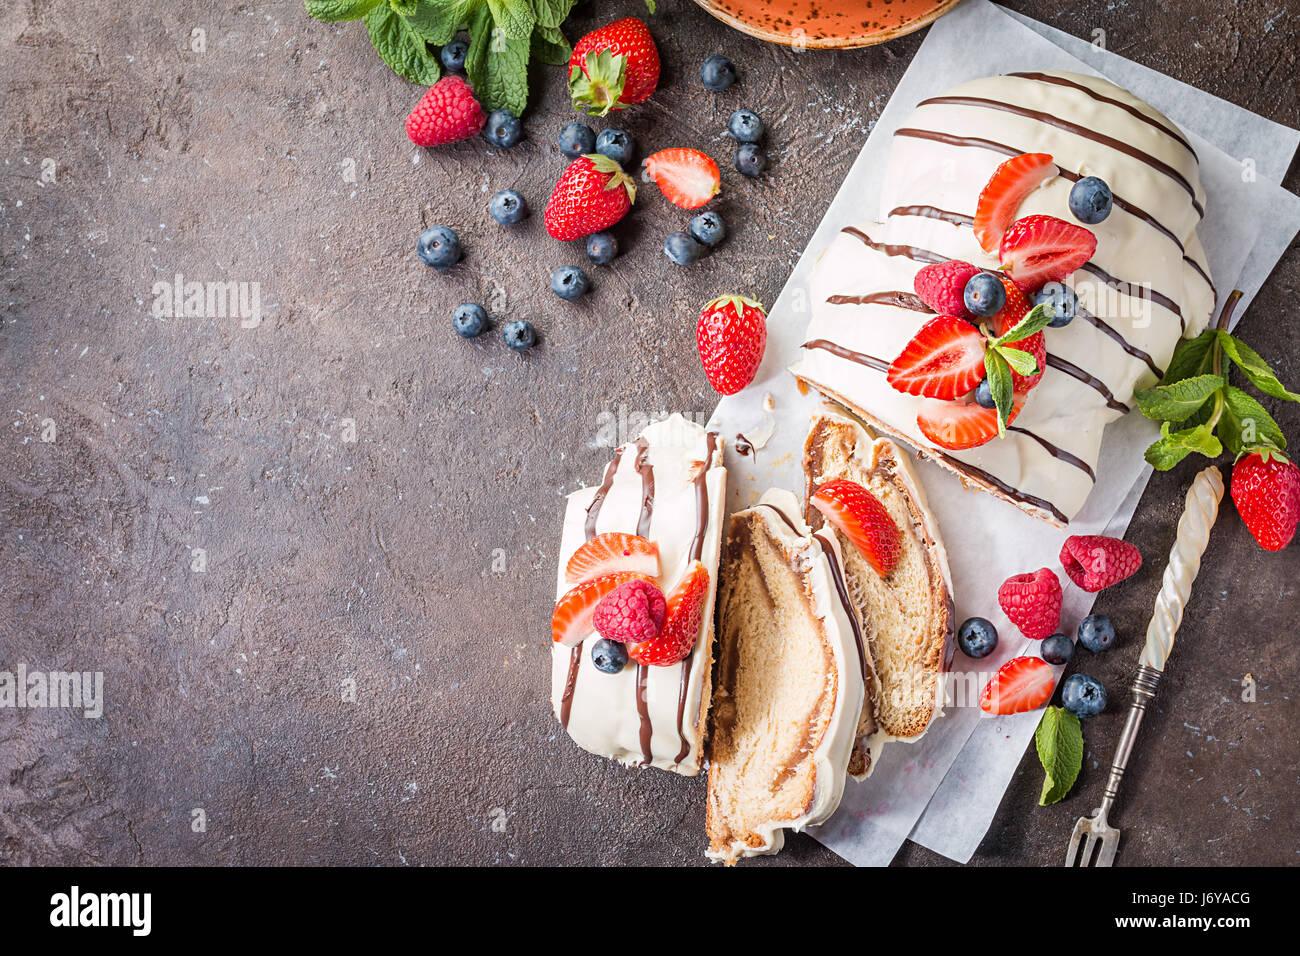 Fresh braided bread - Stock Image